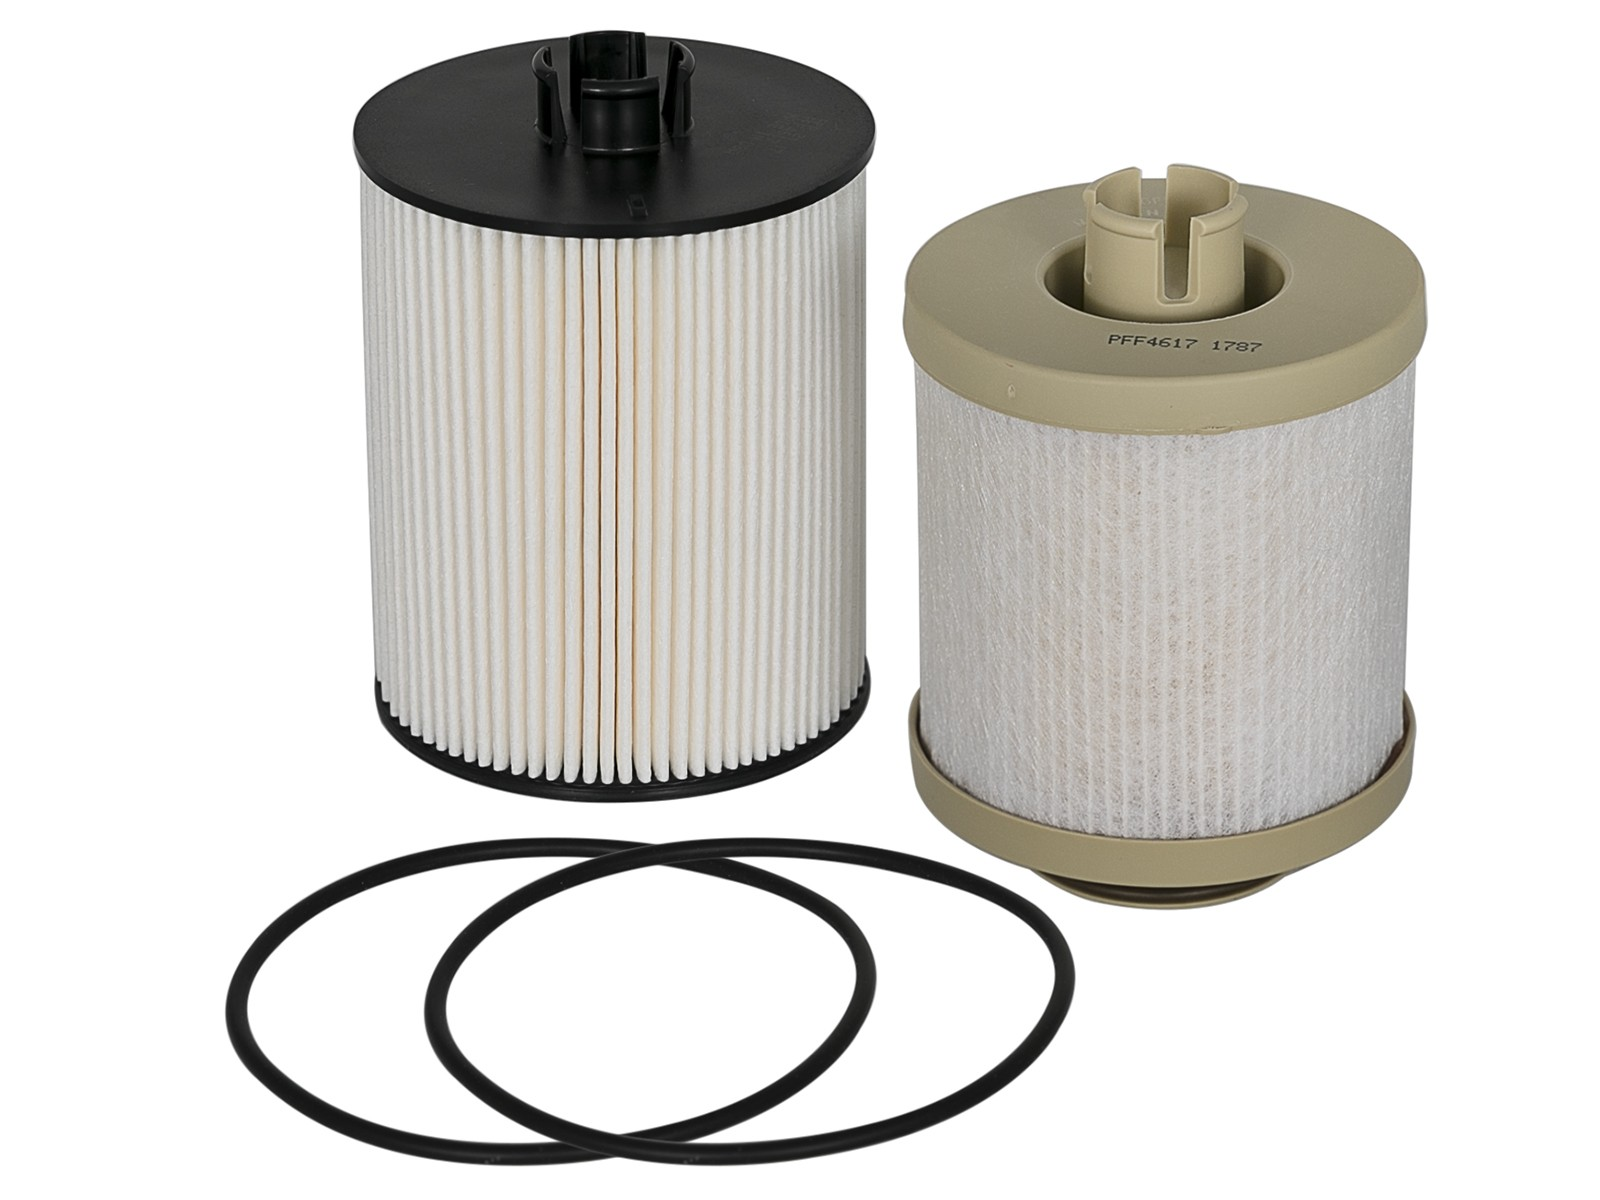 Pro GUARD D2 Fuel Filter | aFe POWER | Afe Duramax Fuel Filter |  | aFe POWER